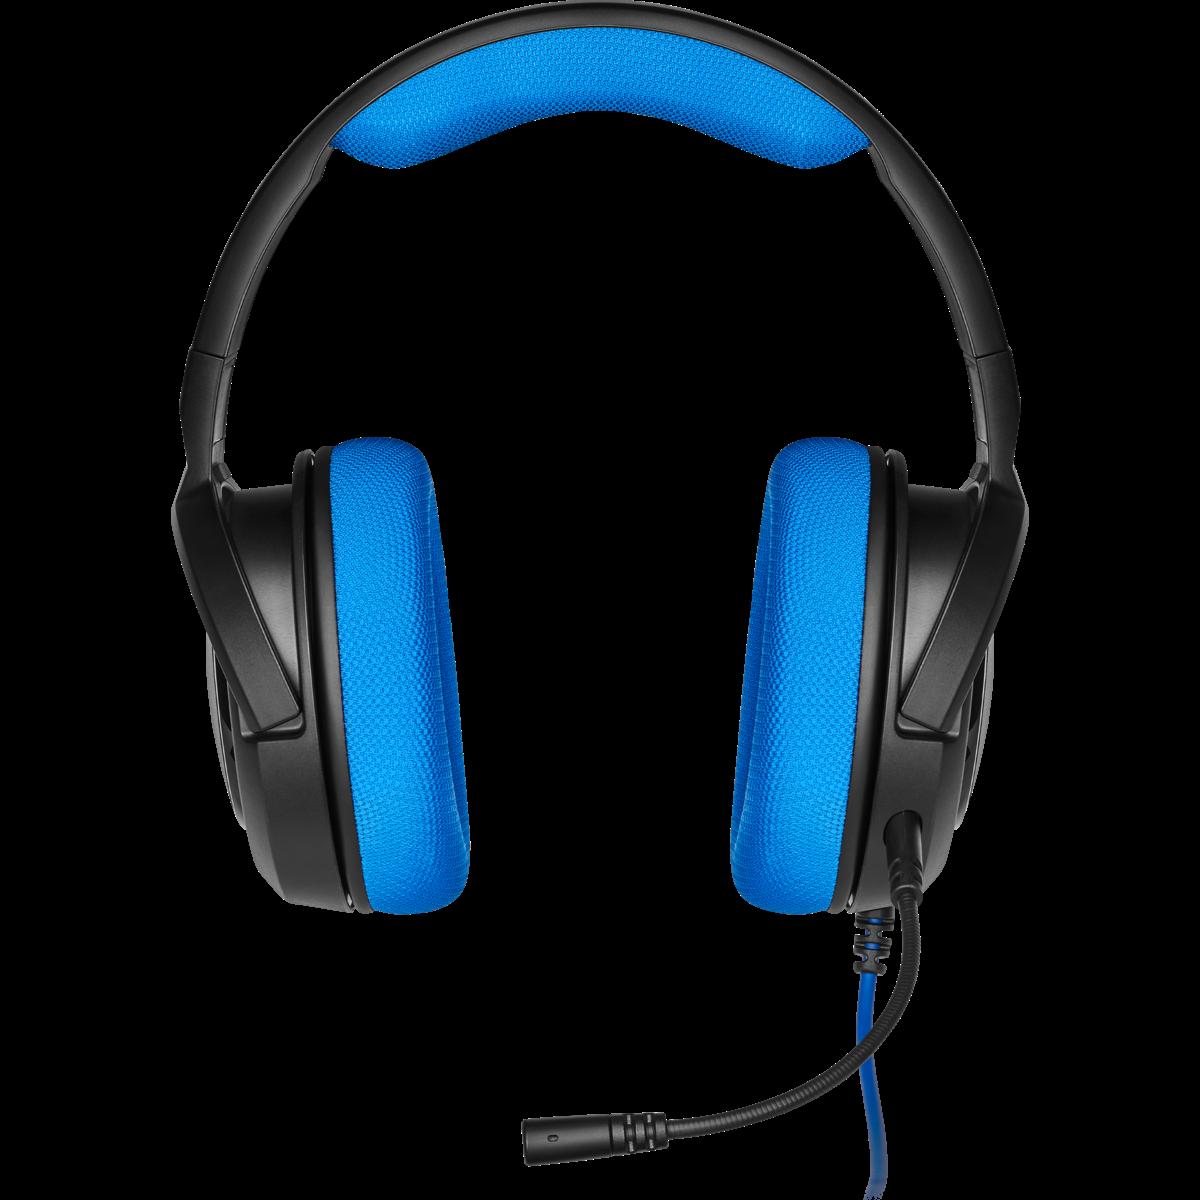 Headset Gamer Corsair HS35 Stereo Blue, CA-9011196-N